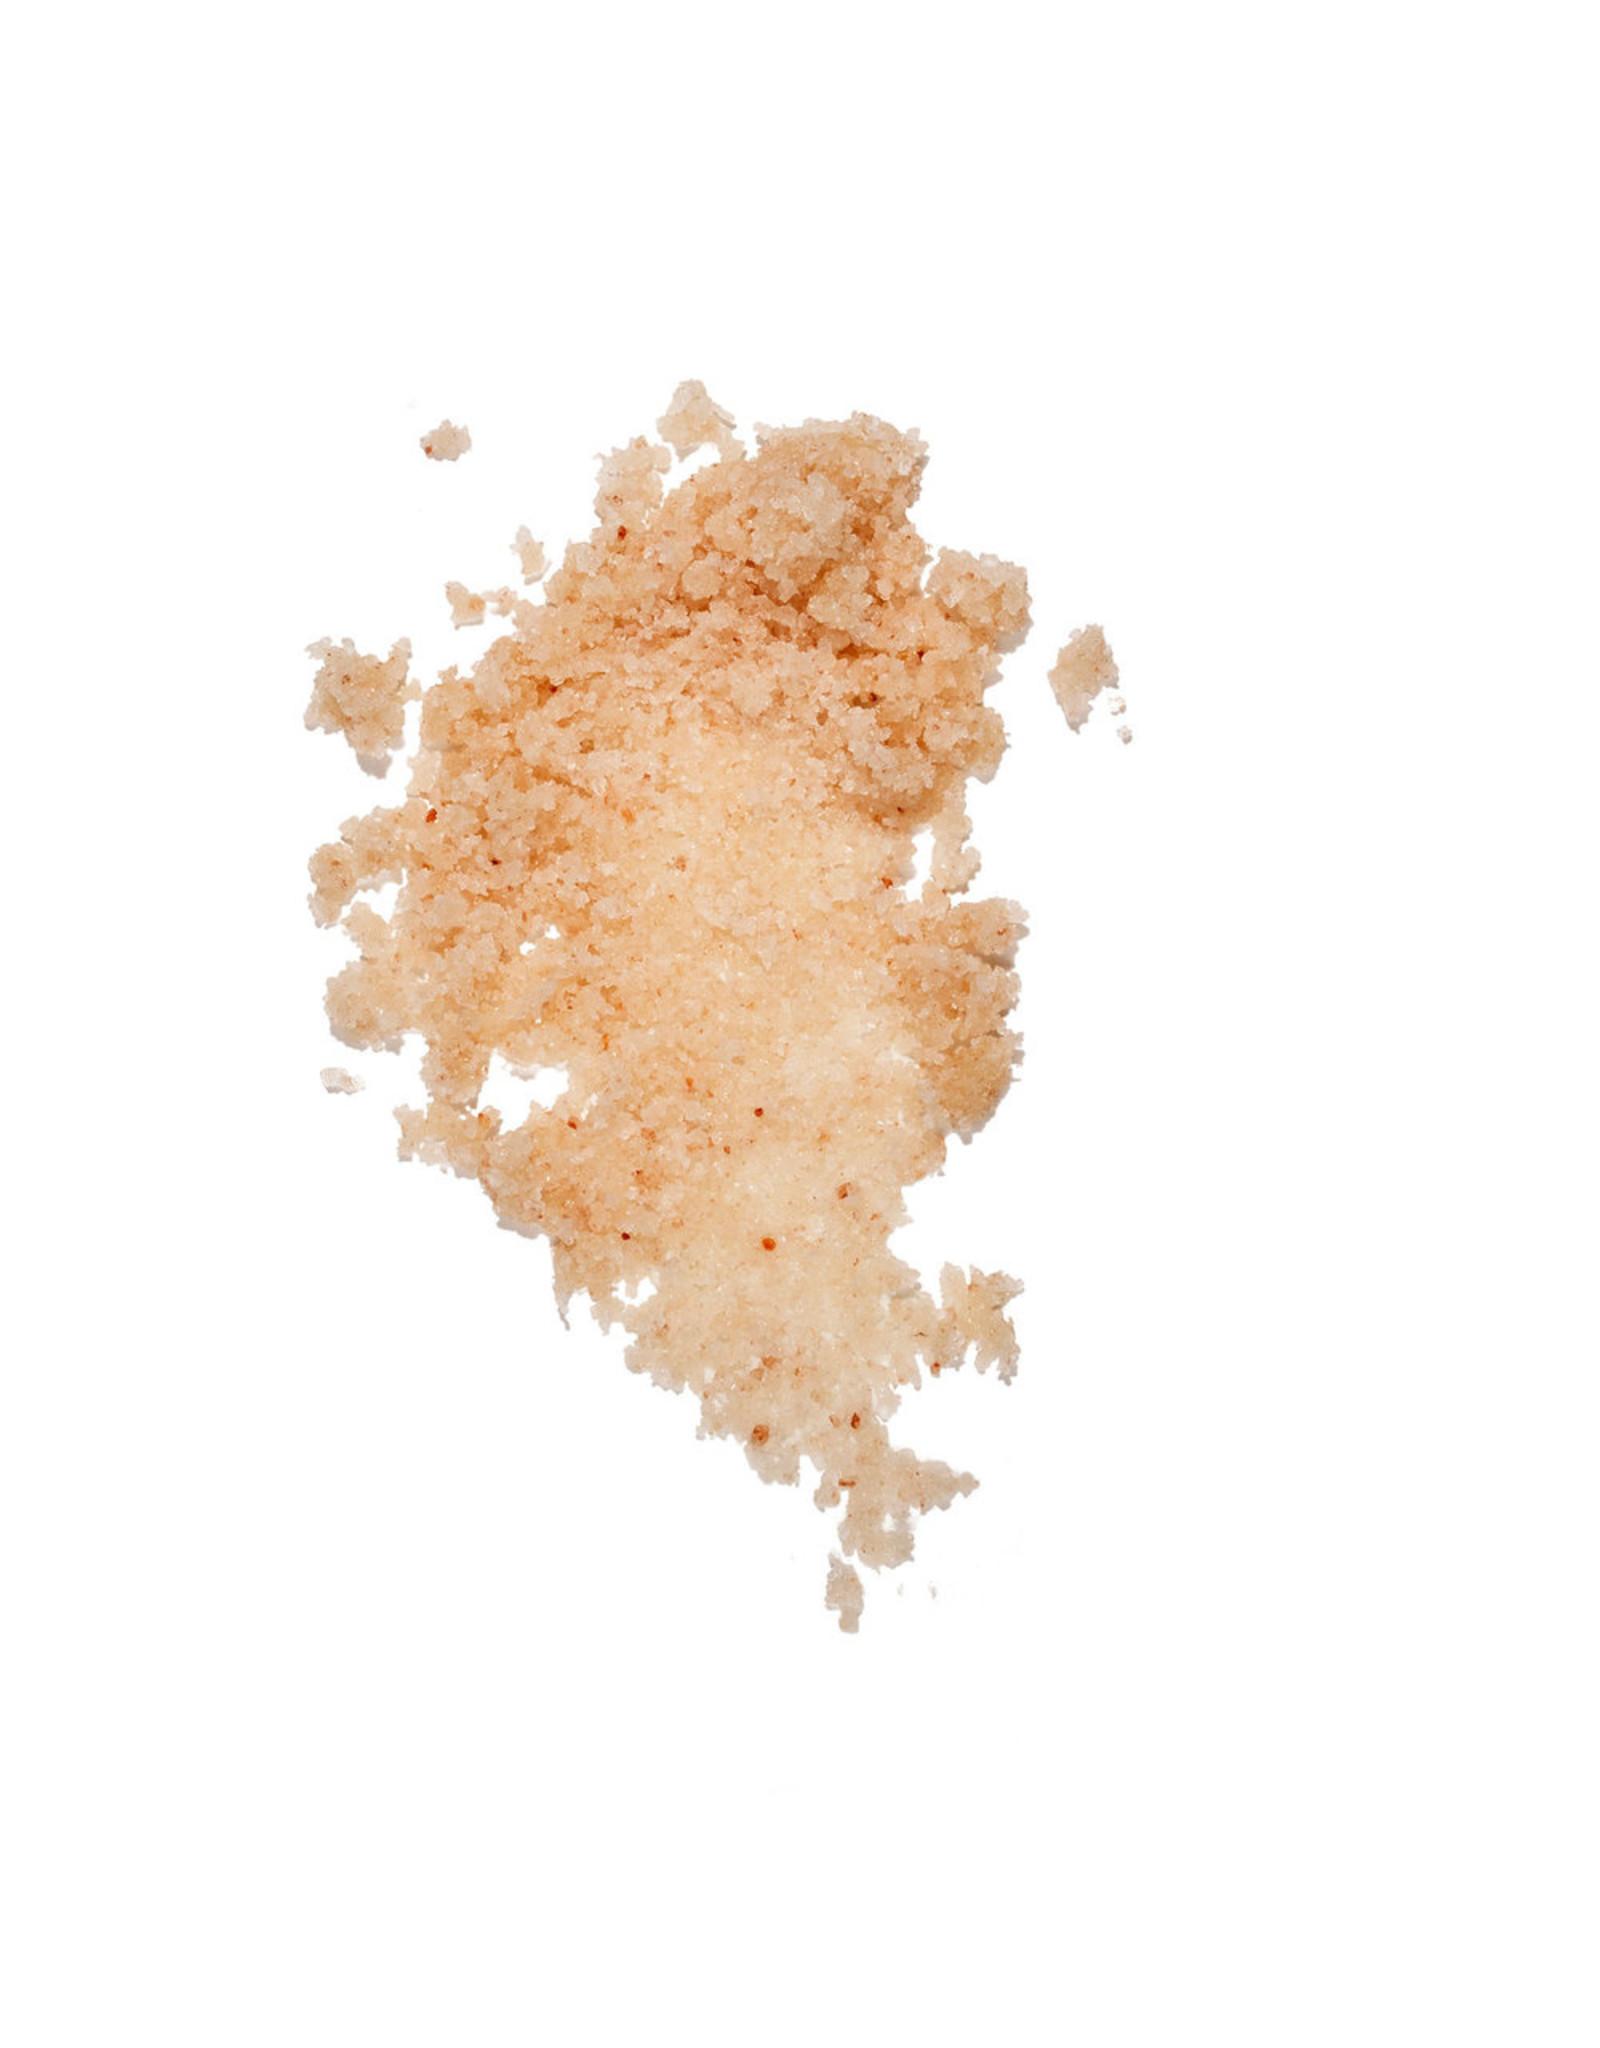 goop Body goop Beauty G.Tox 5 Salt Detox Body Scrub